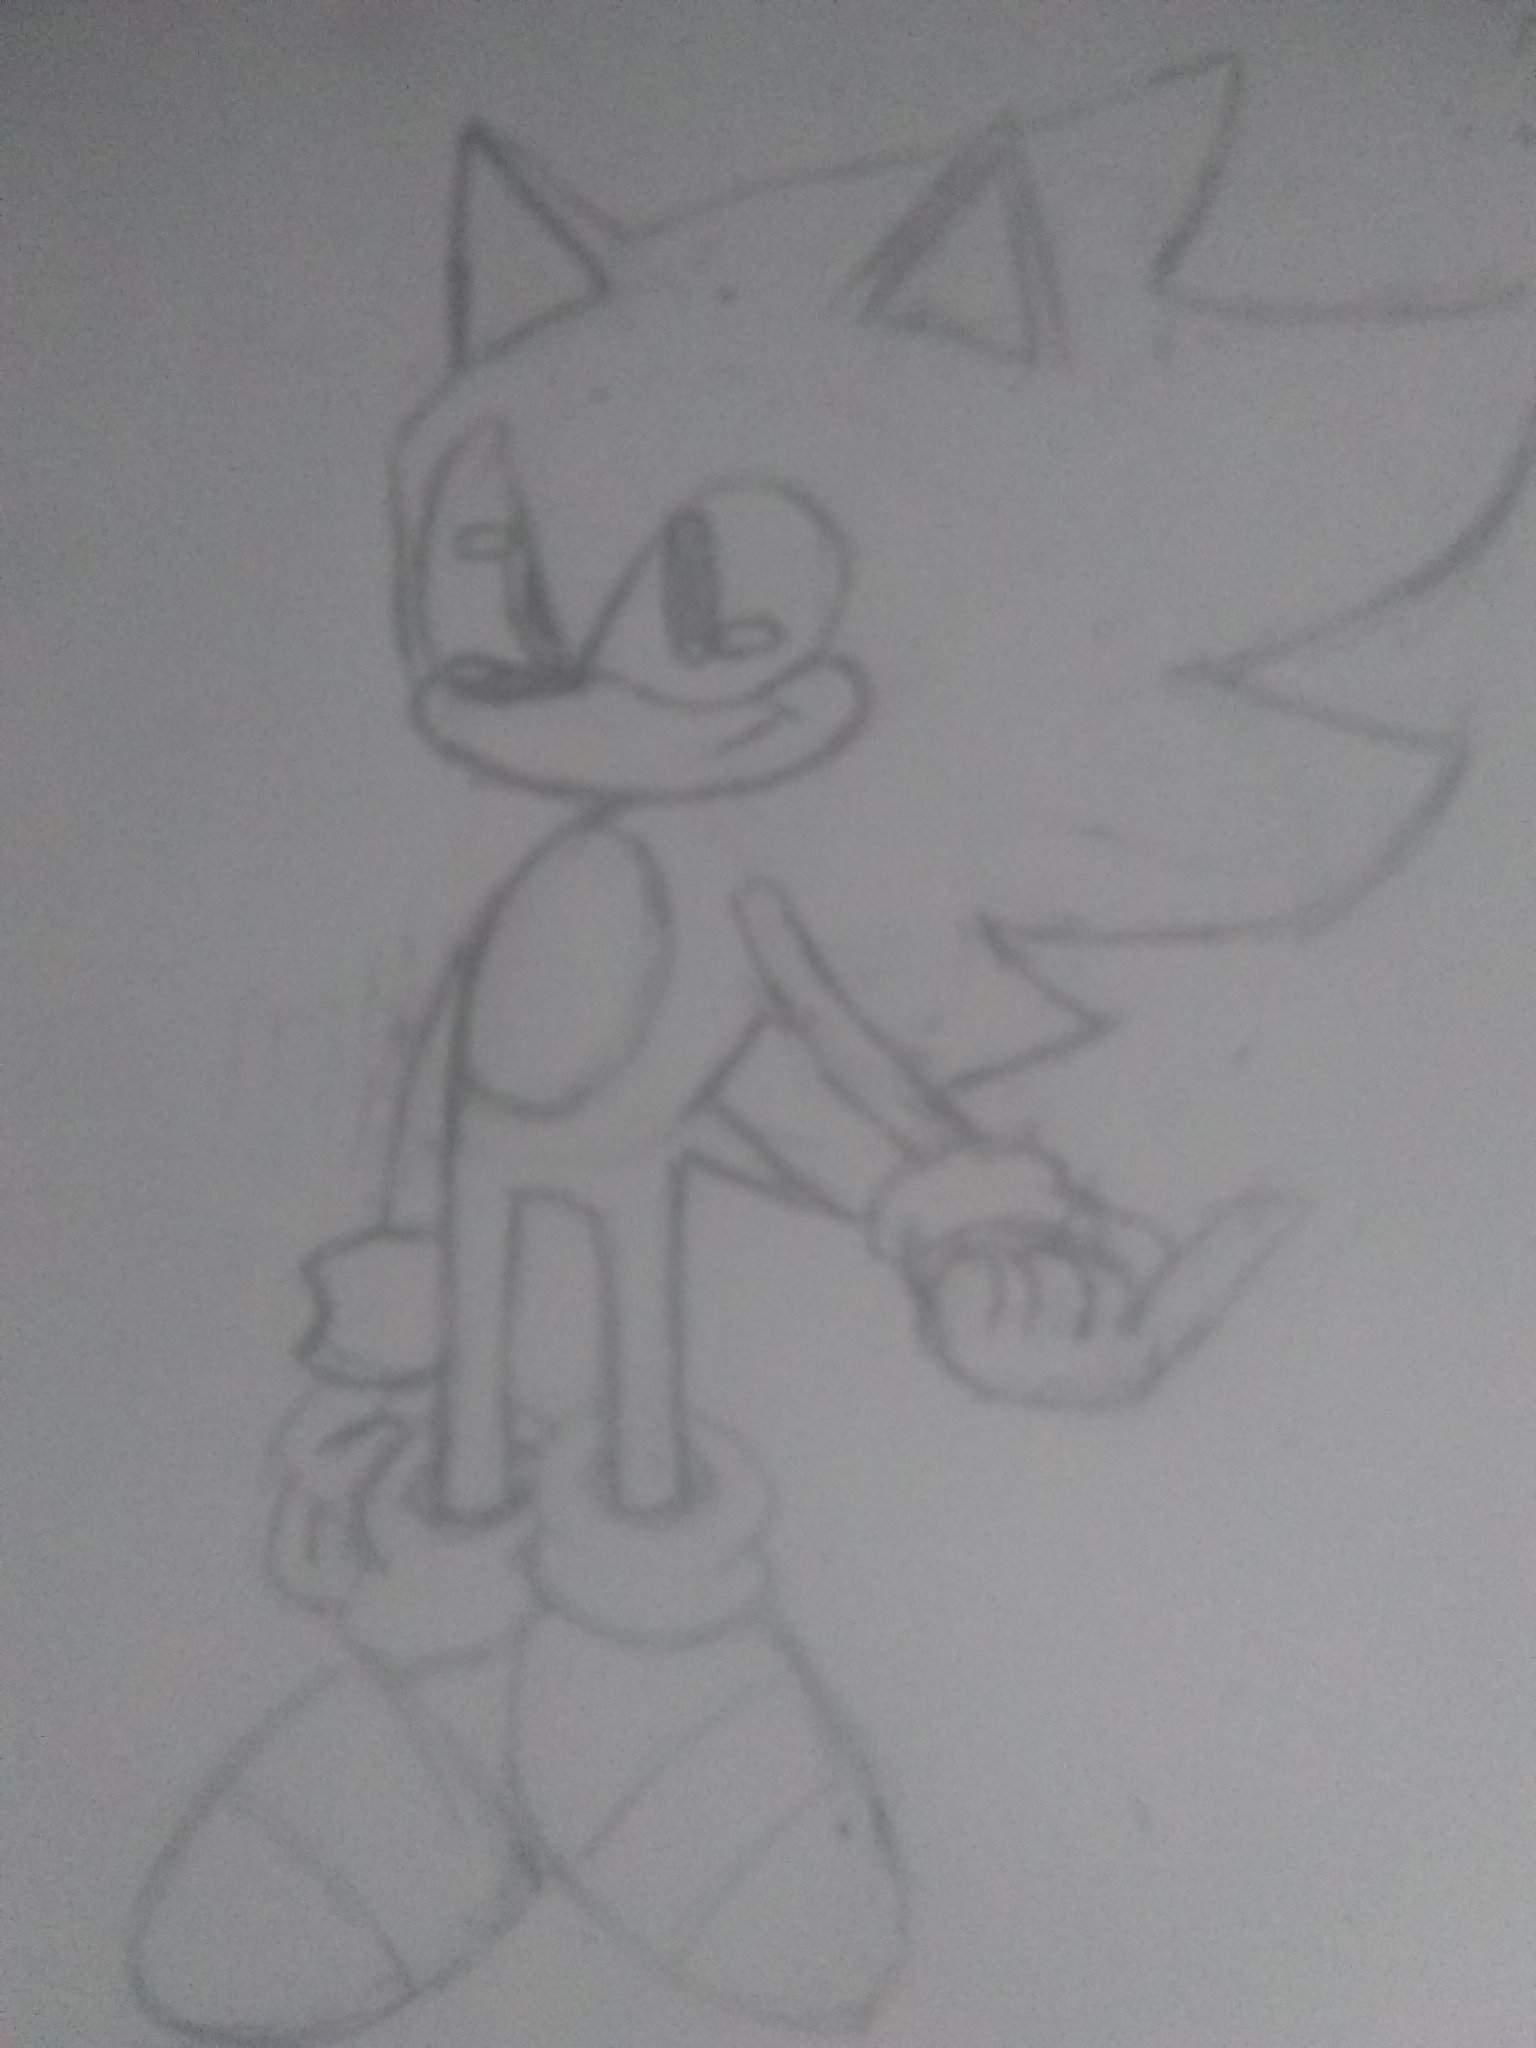 Super Sonic Sonic The Hedgehog Amino